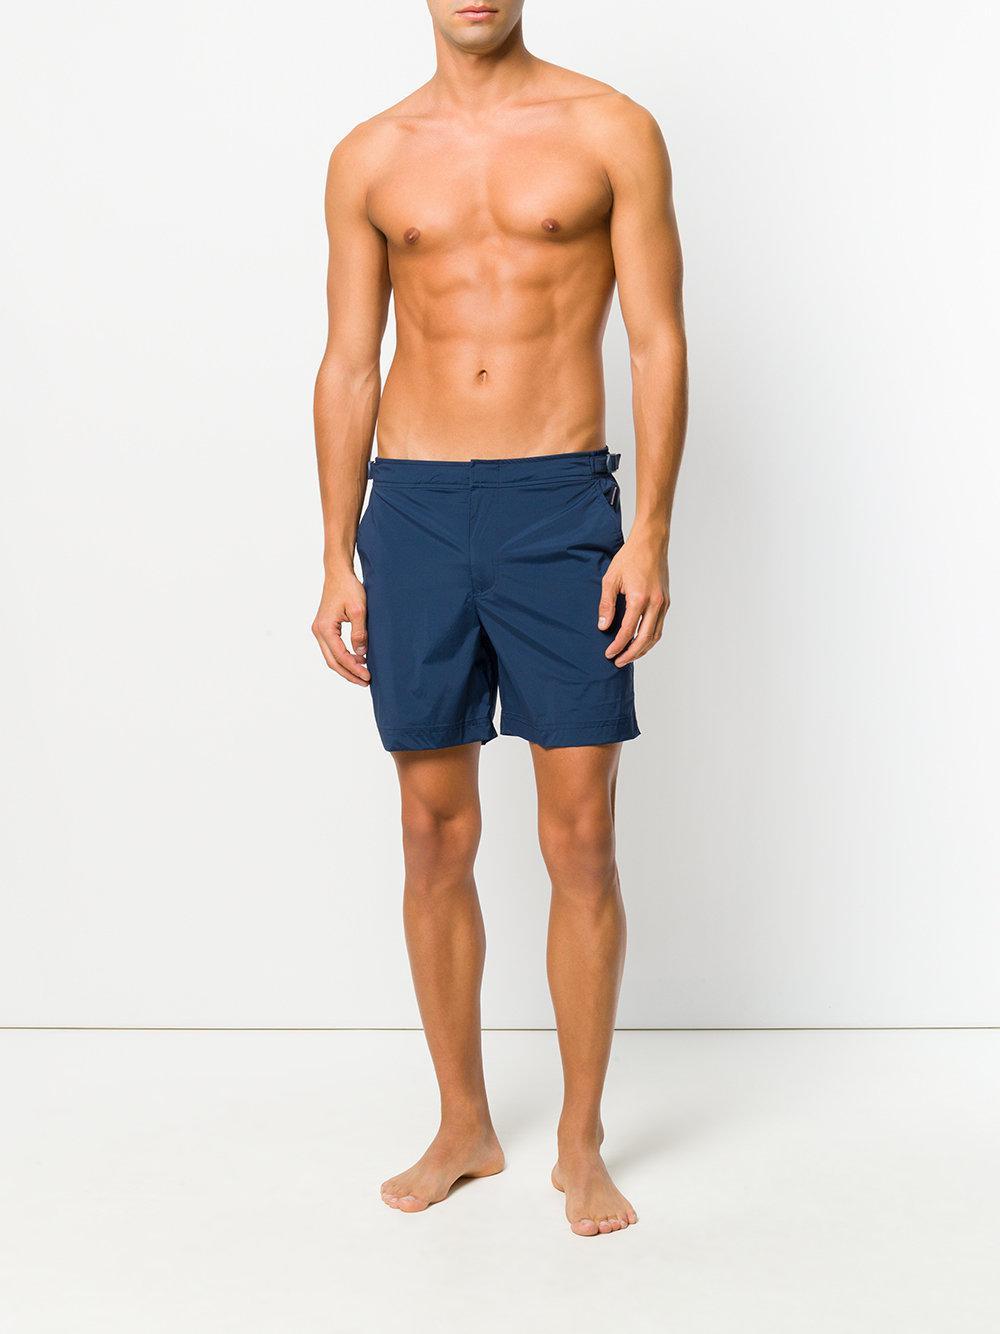 0099010aca Orlebar Brown Side Buckle Swim Shorts in Blue for Men - Lyst